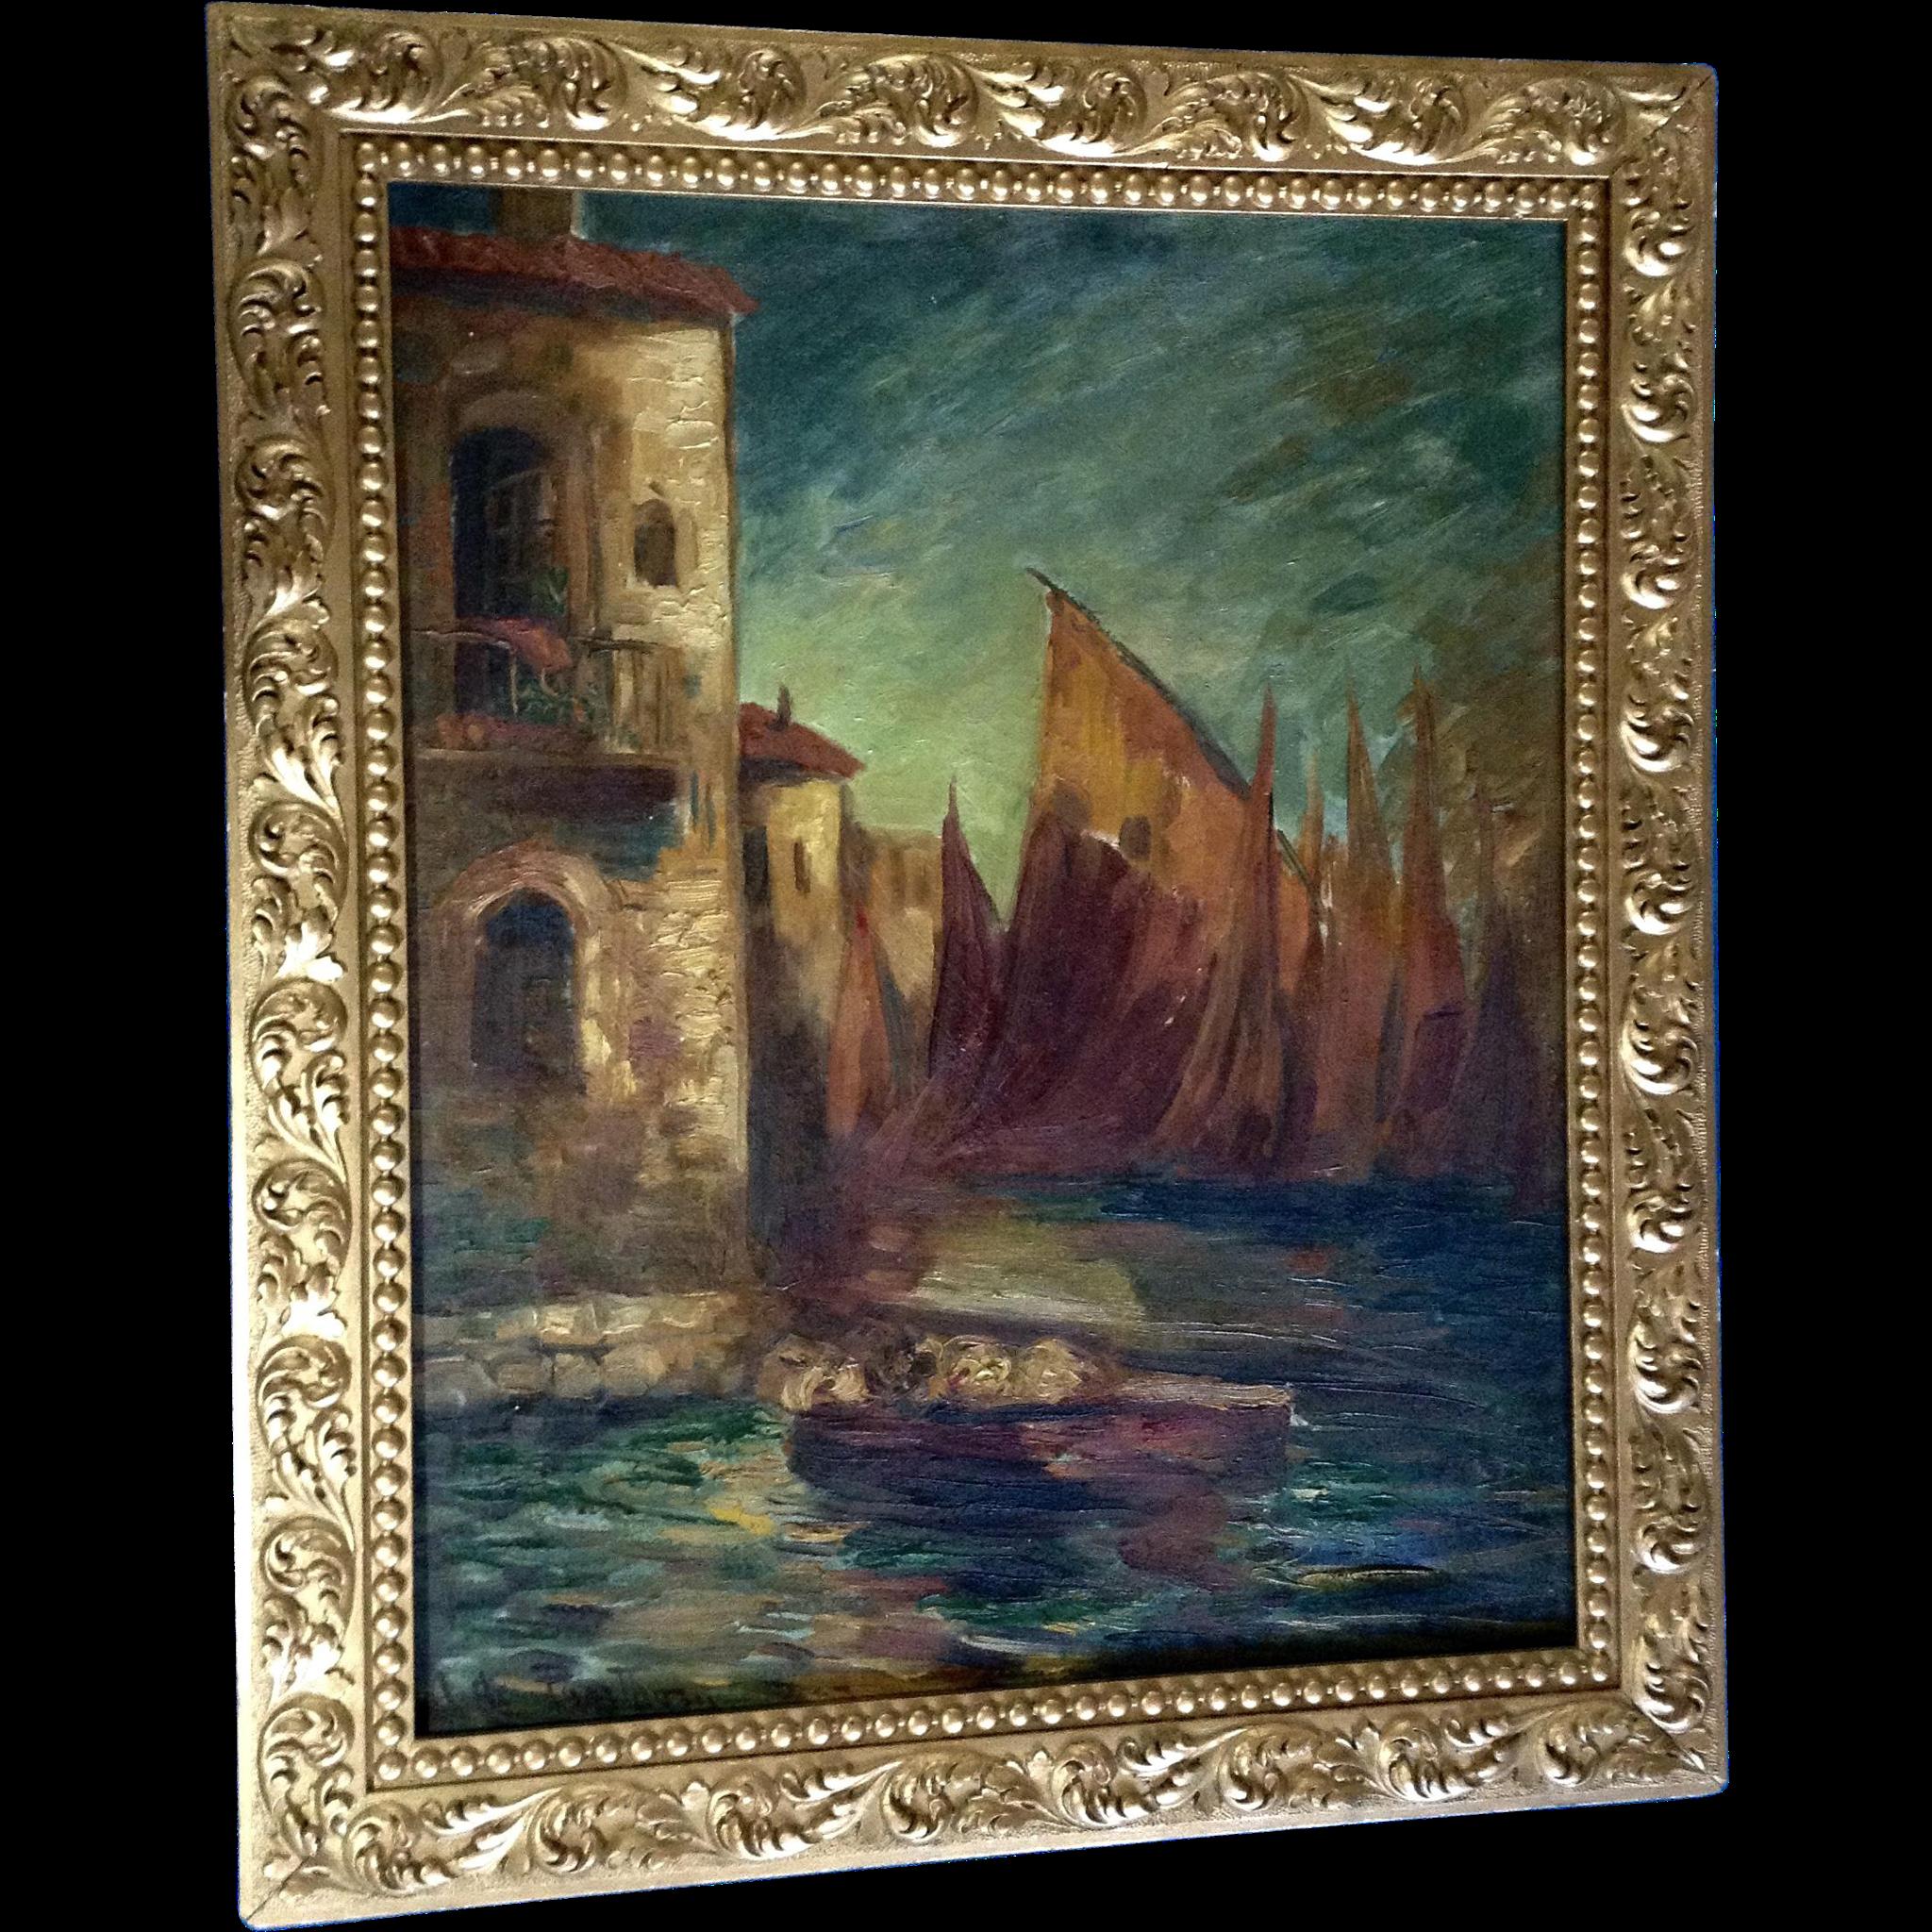 Old Oil Painting On Canvas Venetian Amalfi Coast Sailboats Next To Gumgumfuninthesun